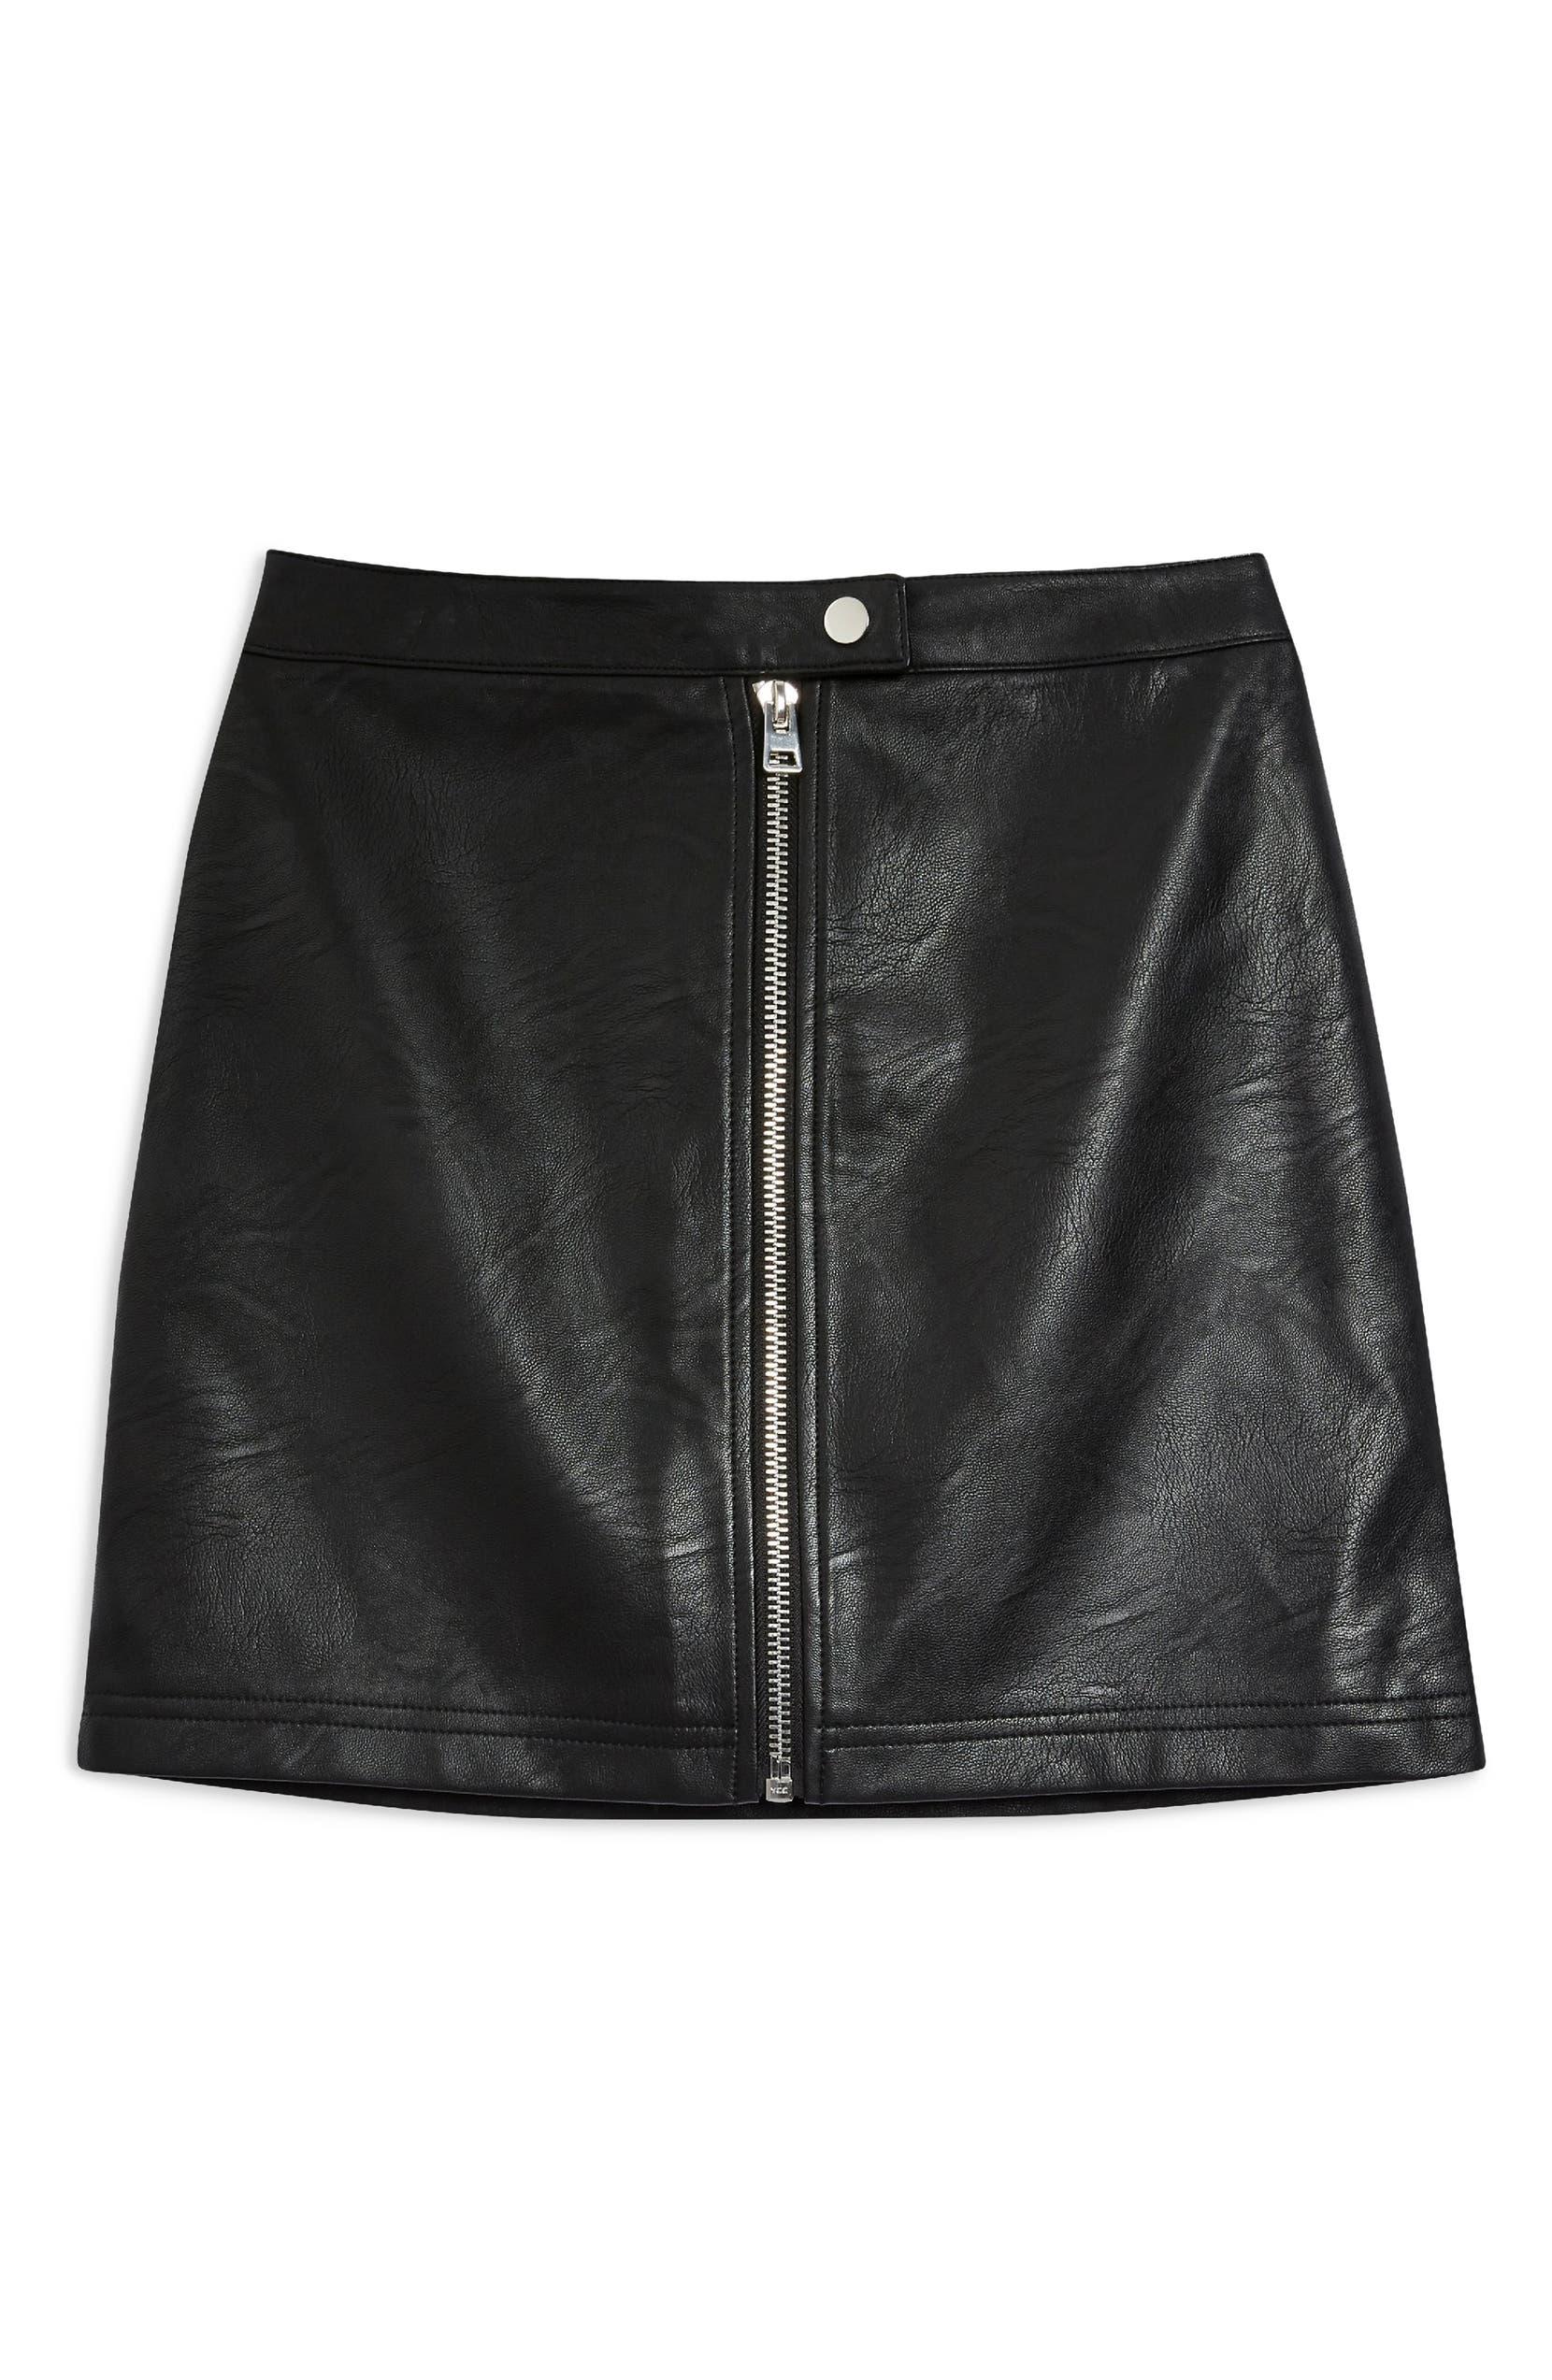 81ef7468d731 Topshop Penelope Faux Leather Miniskirt (Regular & Petite) | Nordstrom